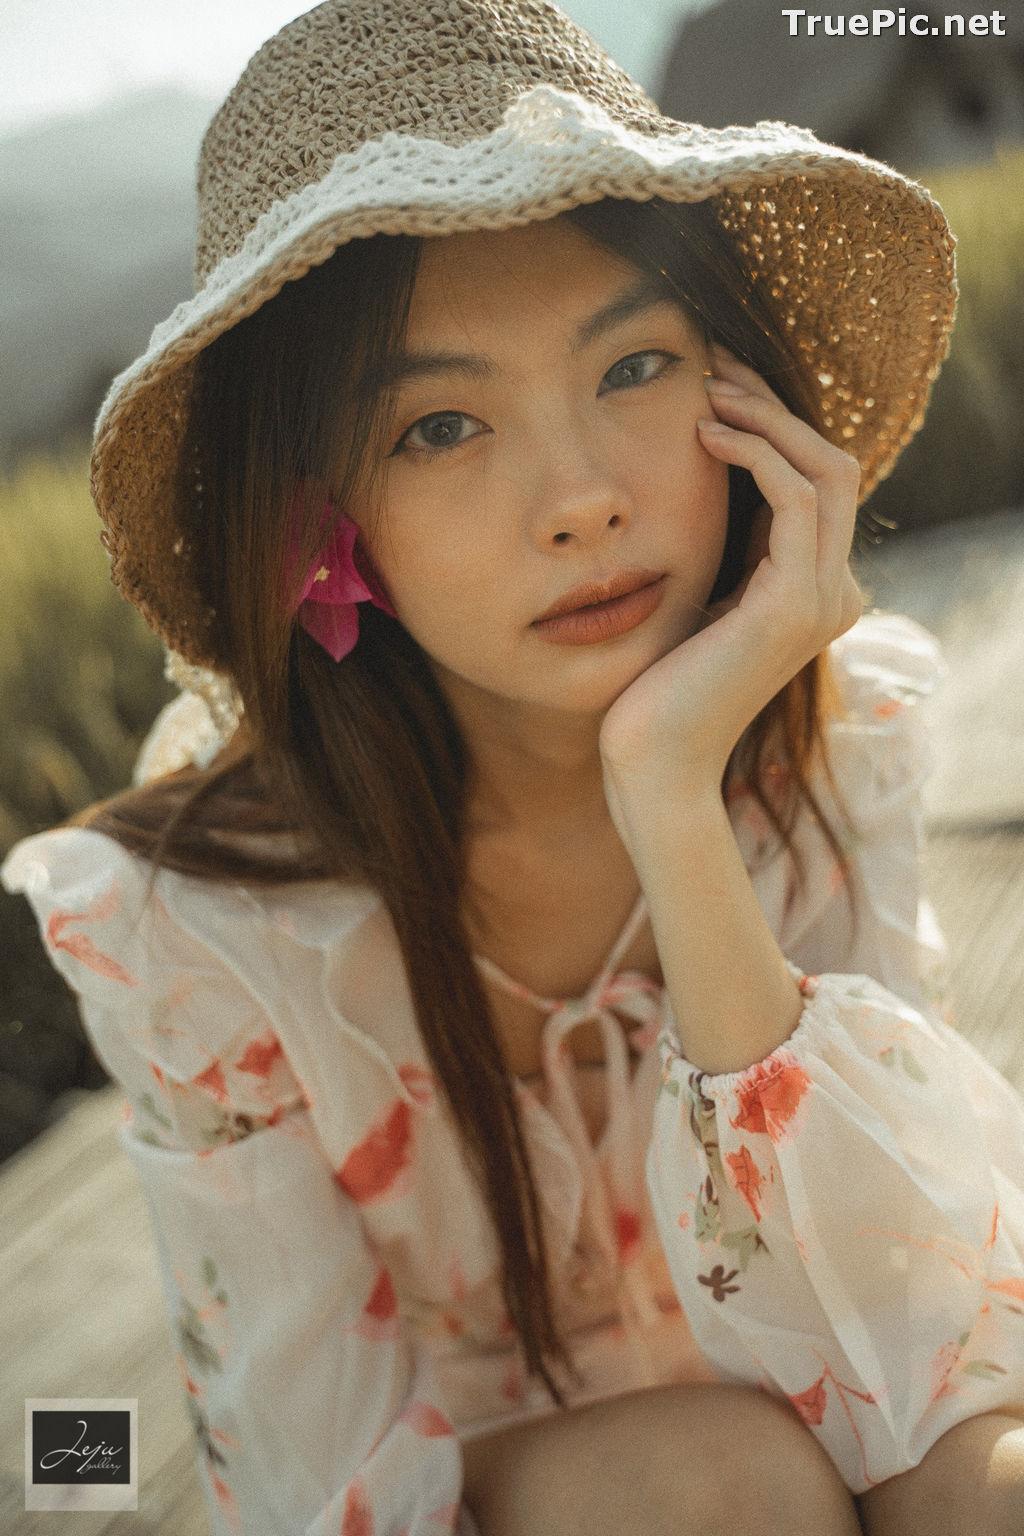 Image Thailand Hot Model - Nut Theerarat - Nutwch Black Pink - TruePic.net - Picture-9